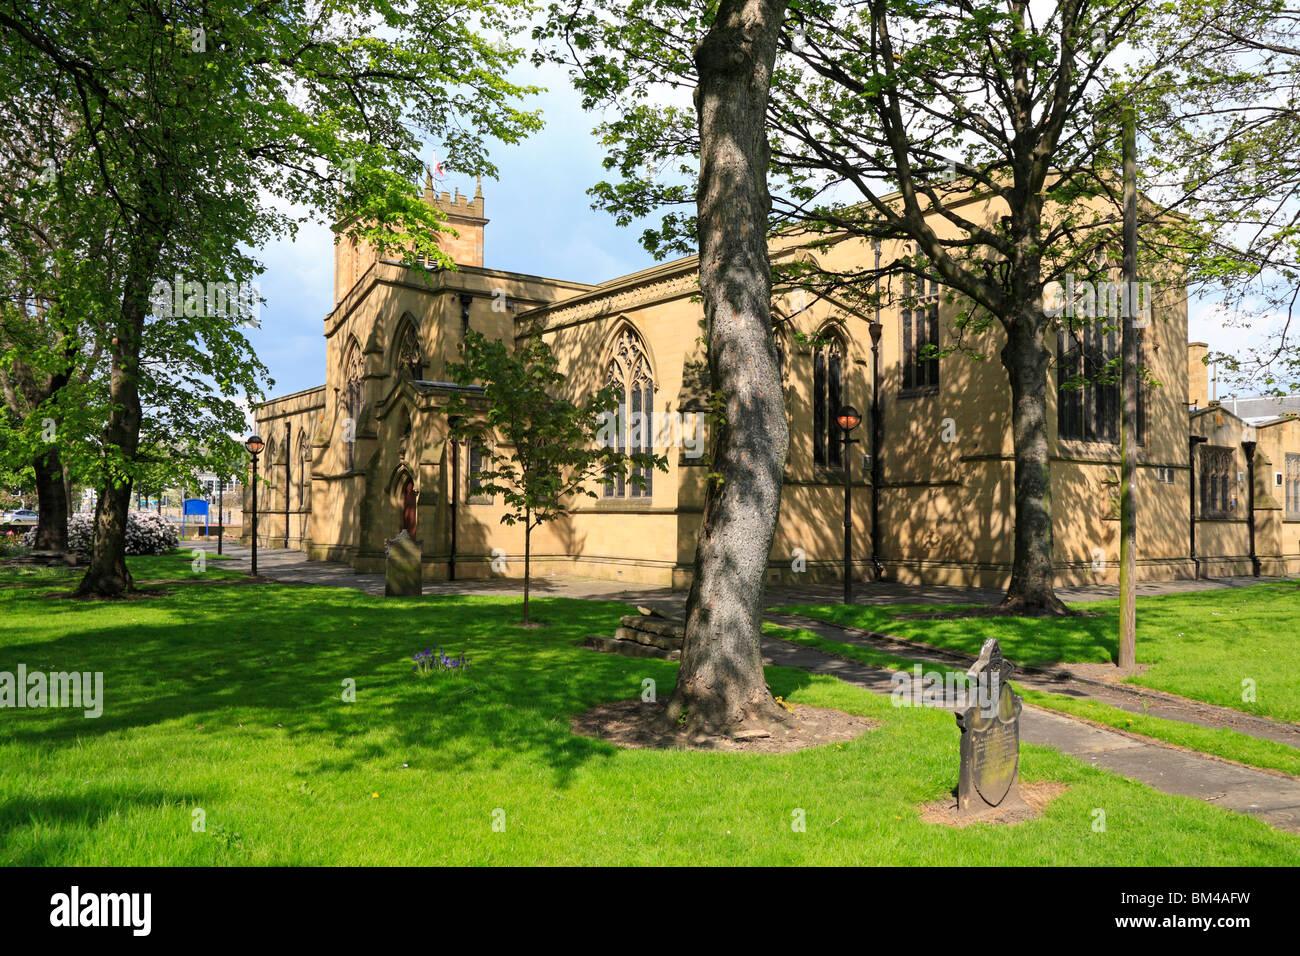 Dewsbury Minster, All Saints Church, Dewsbury, West Yorkshire, England, UK. - Stock Image